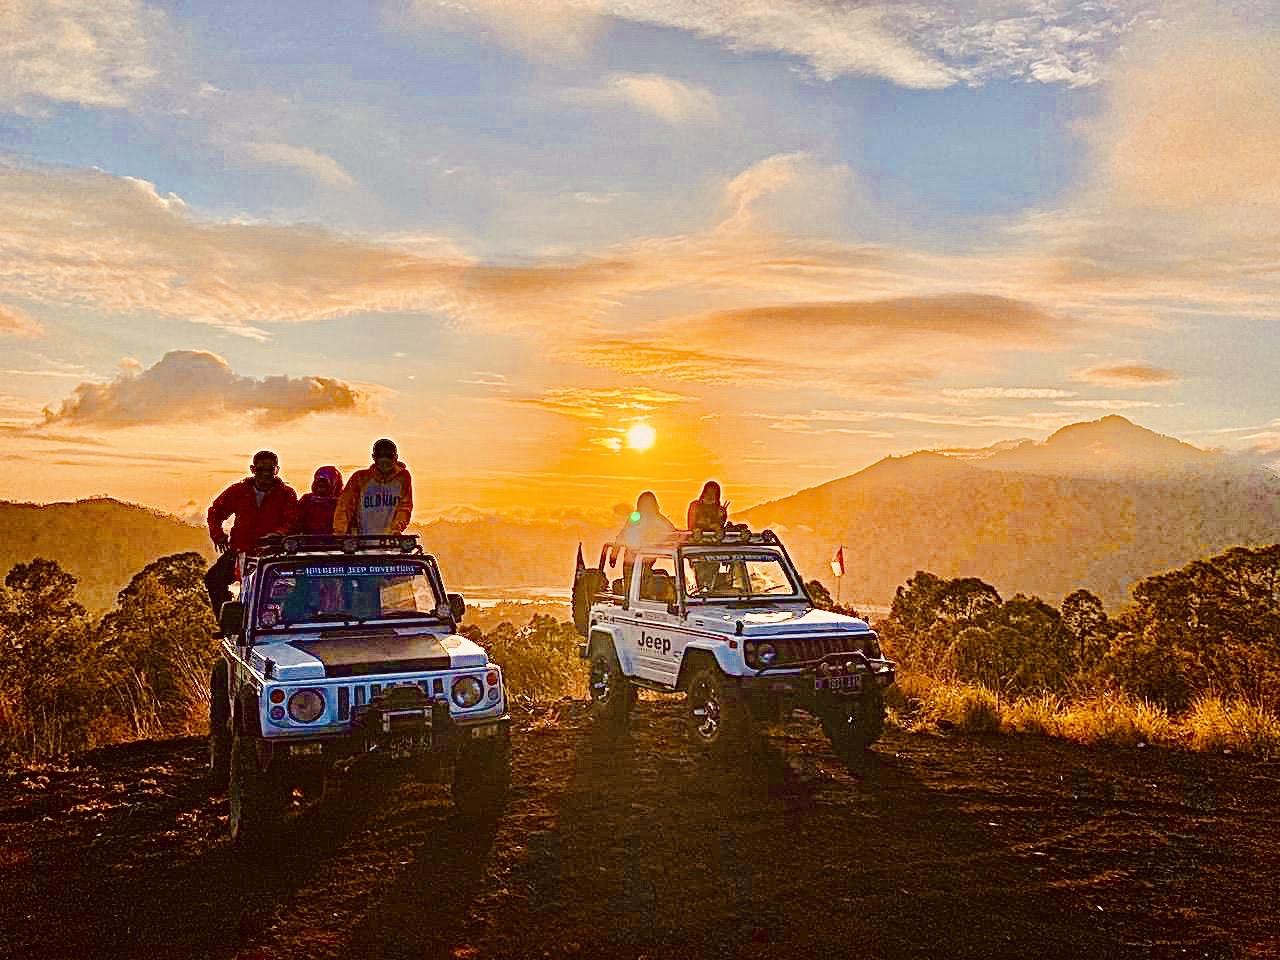 Mount Batur Sunrise Volcano trip: Bali 4WD Jeep Adventure